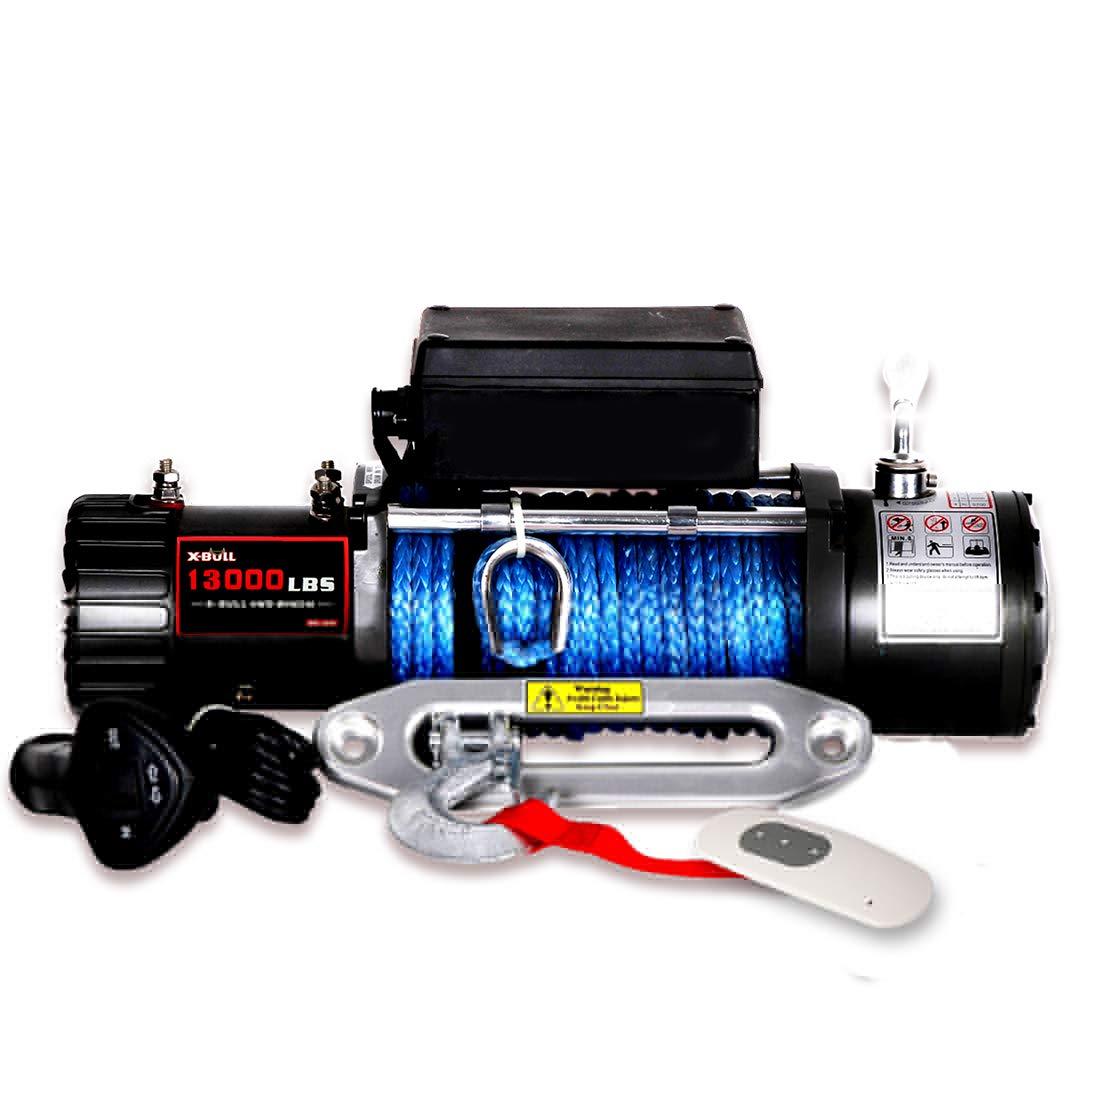 X-BULL 12V Waterproof Synthetic Rope Winch-13000 lb. Load Capacity IP67 (Black) by X-BULL